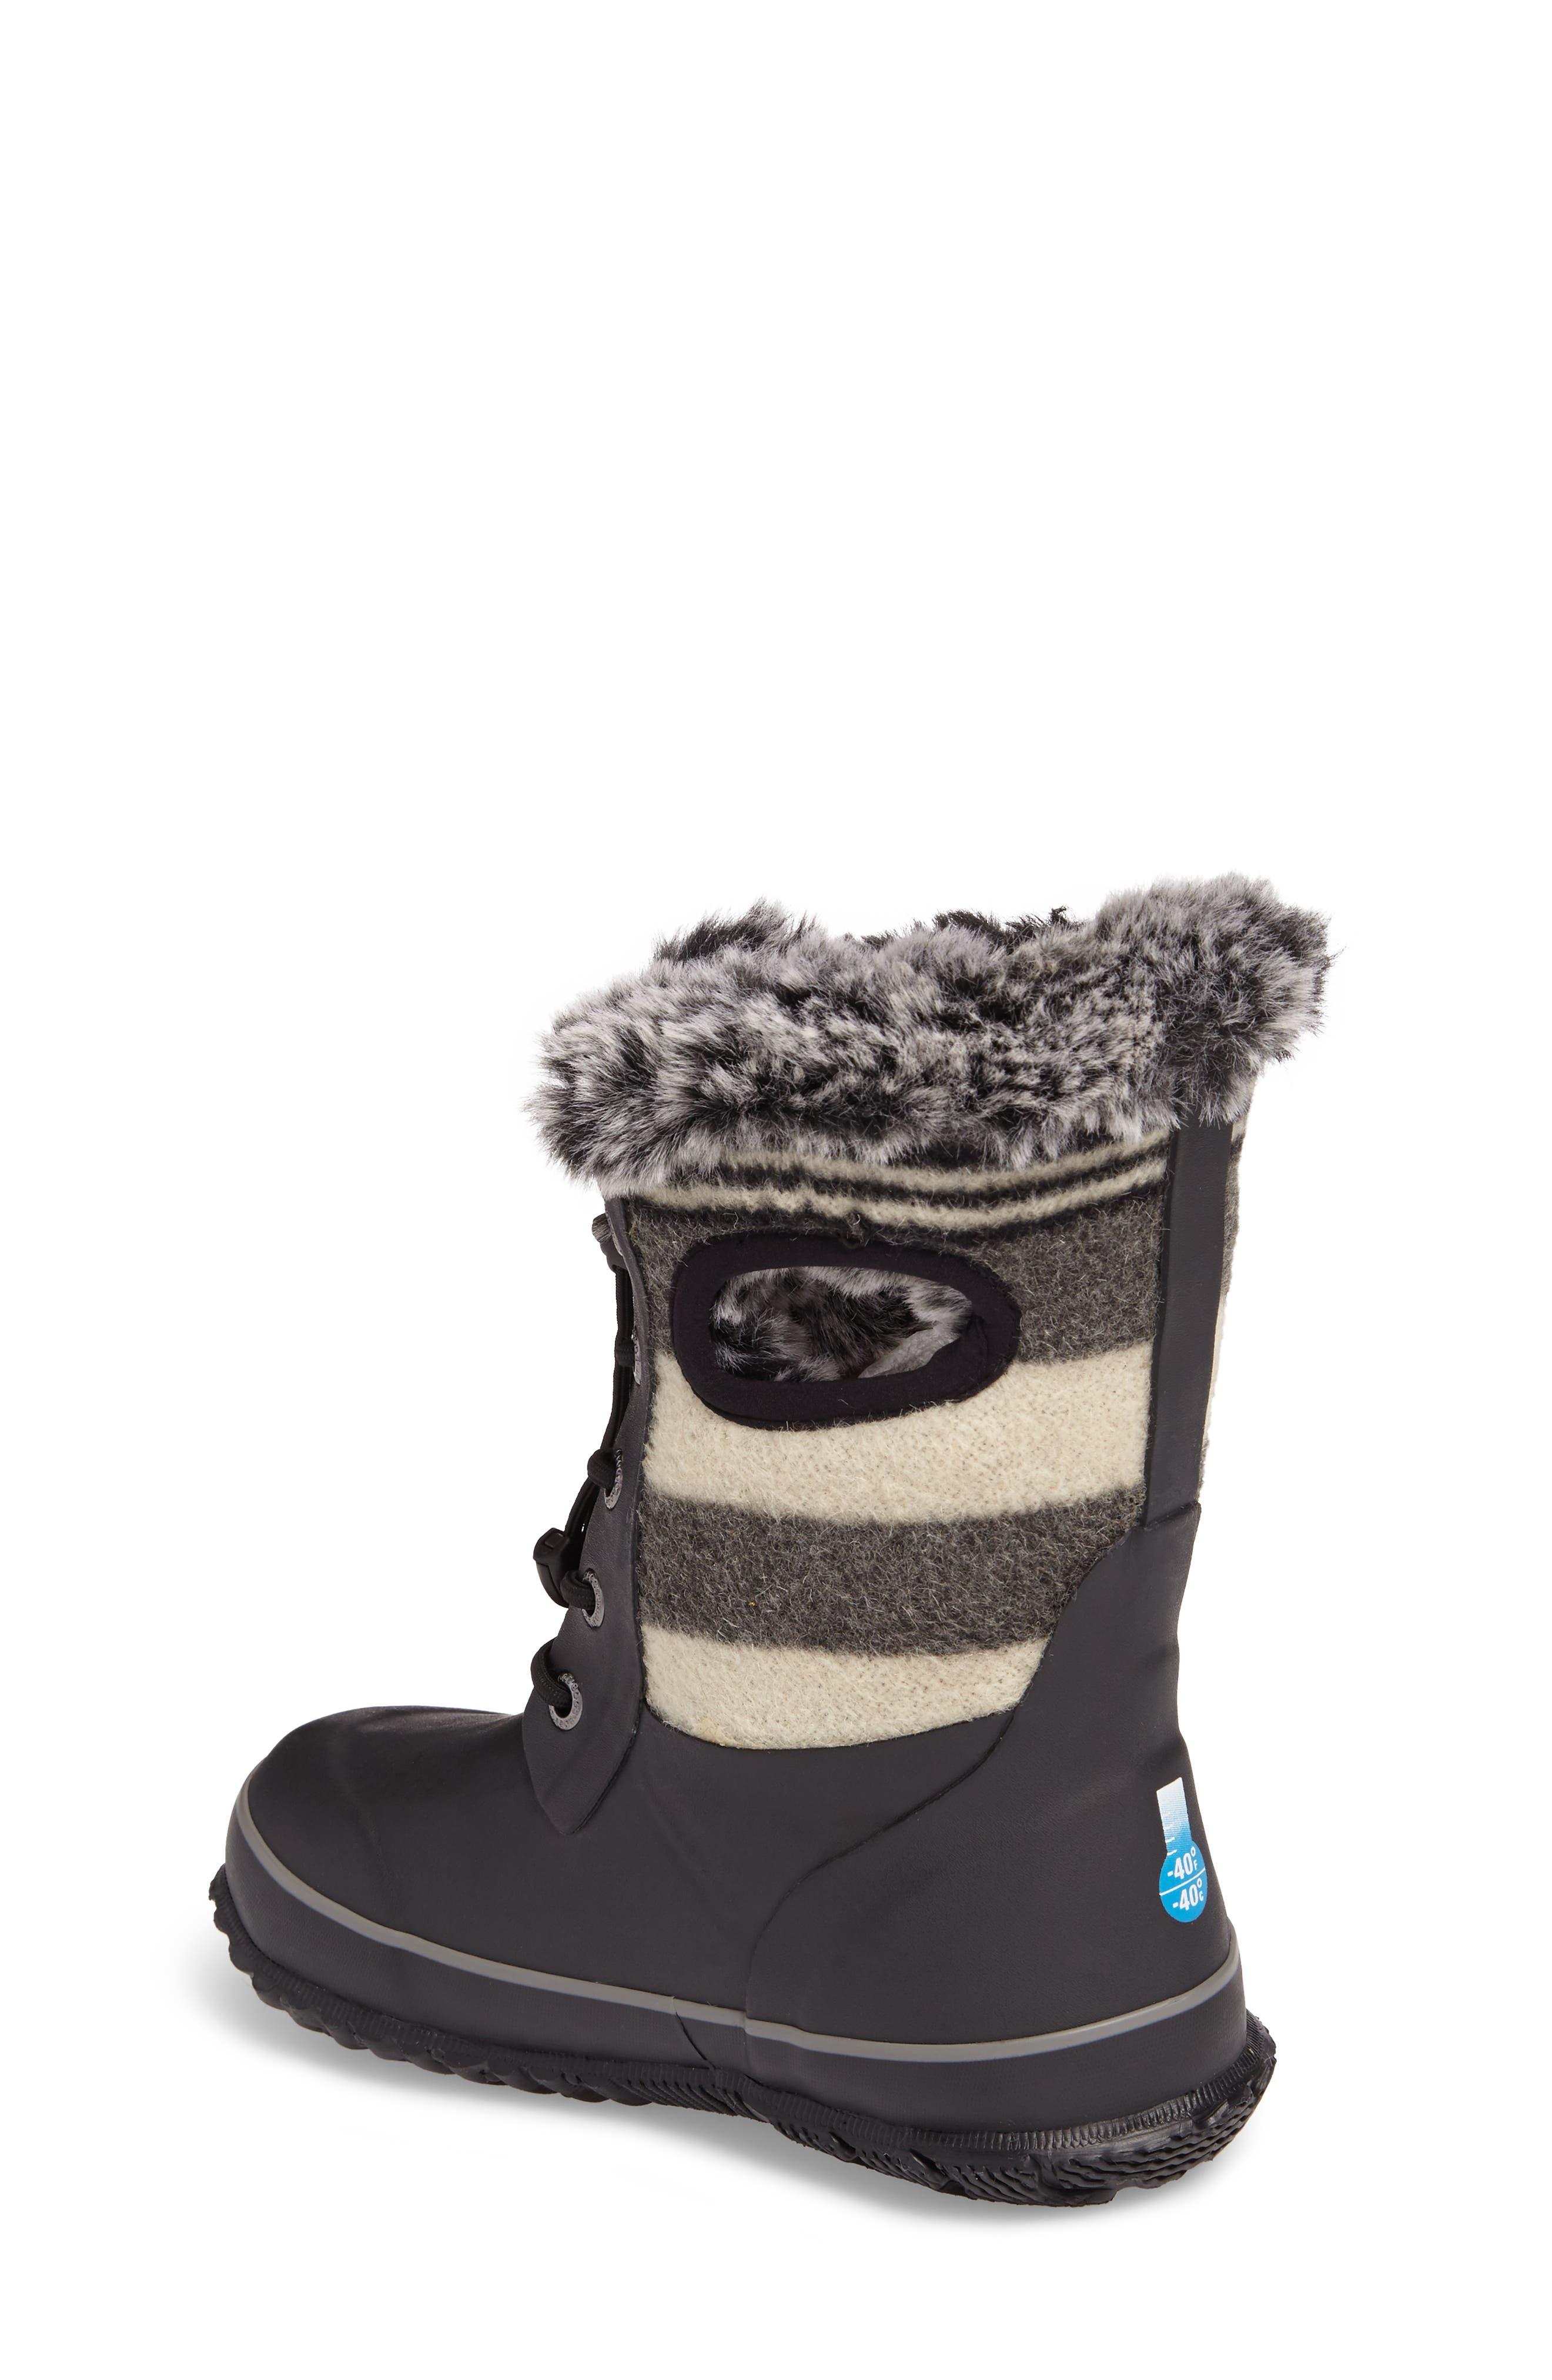 Alternate Image 2  - Bogs Arcata Stripe Waterproof Insulated Faux Fur Boot (Walker, Toddler, Little Kid & Big Kid)